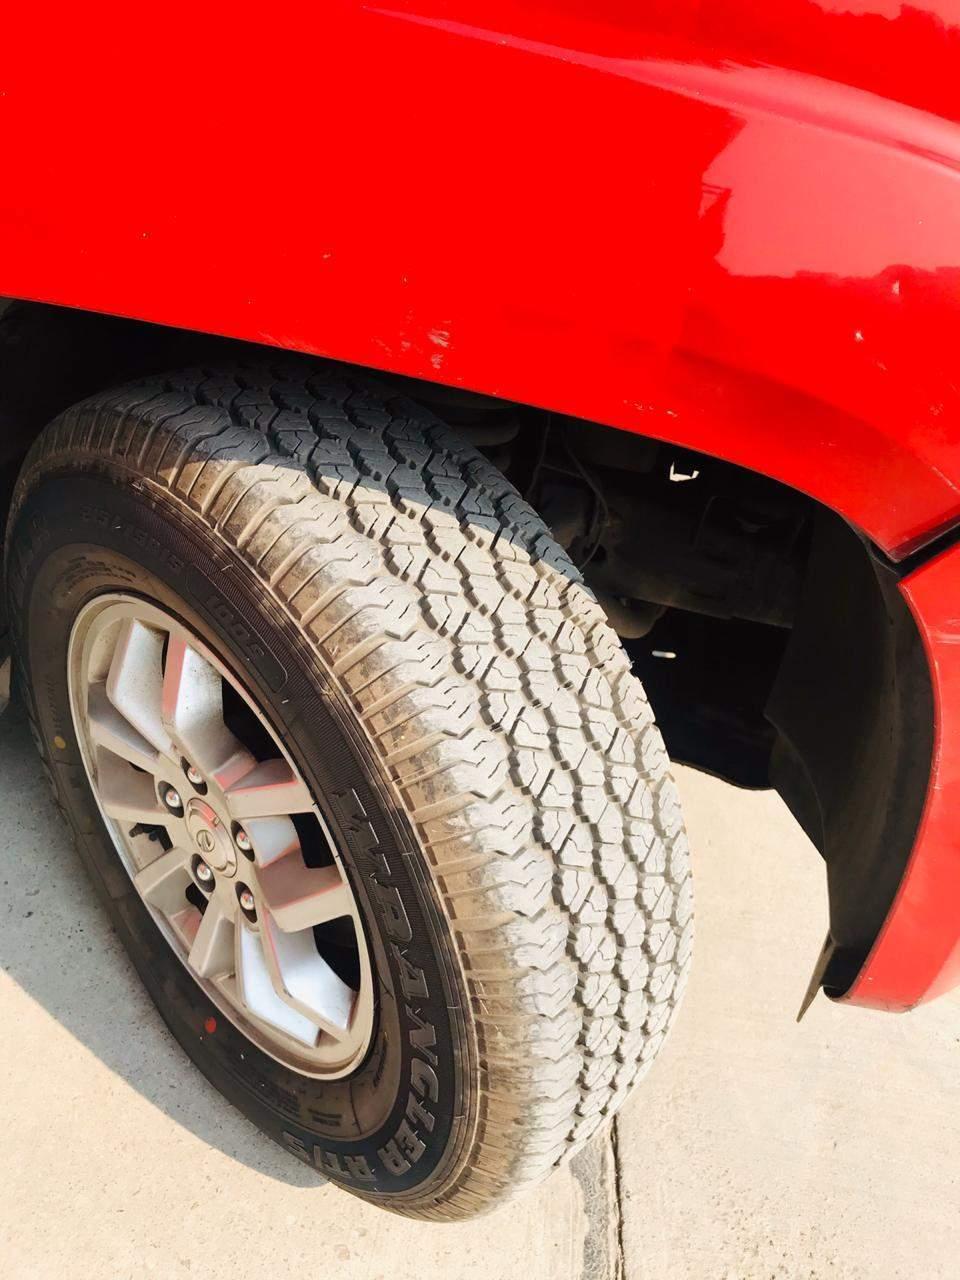 Mahindra Tuv300 Rear Left Side Angle View